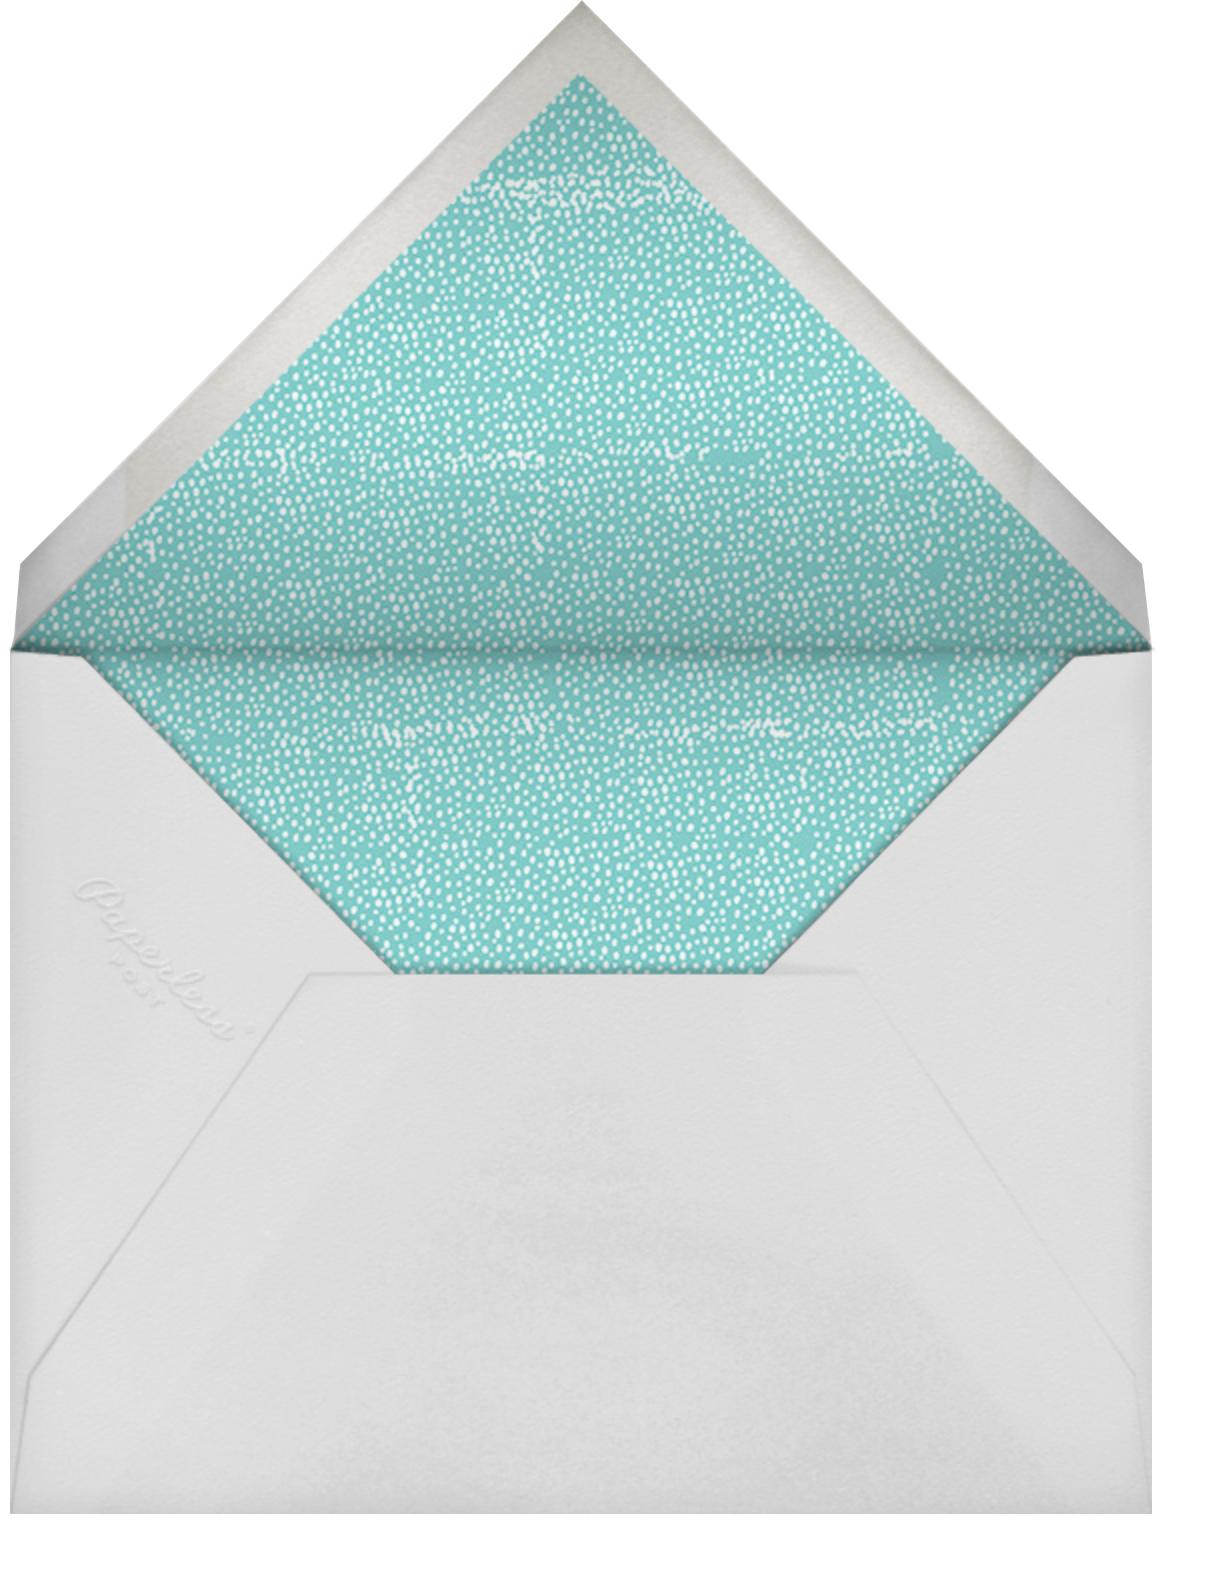 Hit the Lanes - Bermuda - Mr. Boddington's Studio - Adult birthday - envelope back